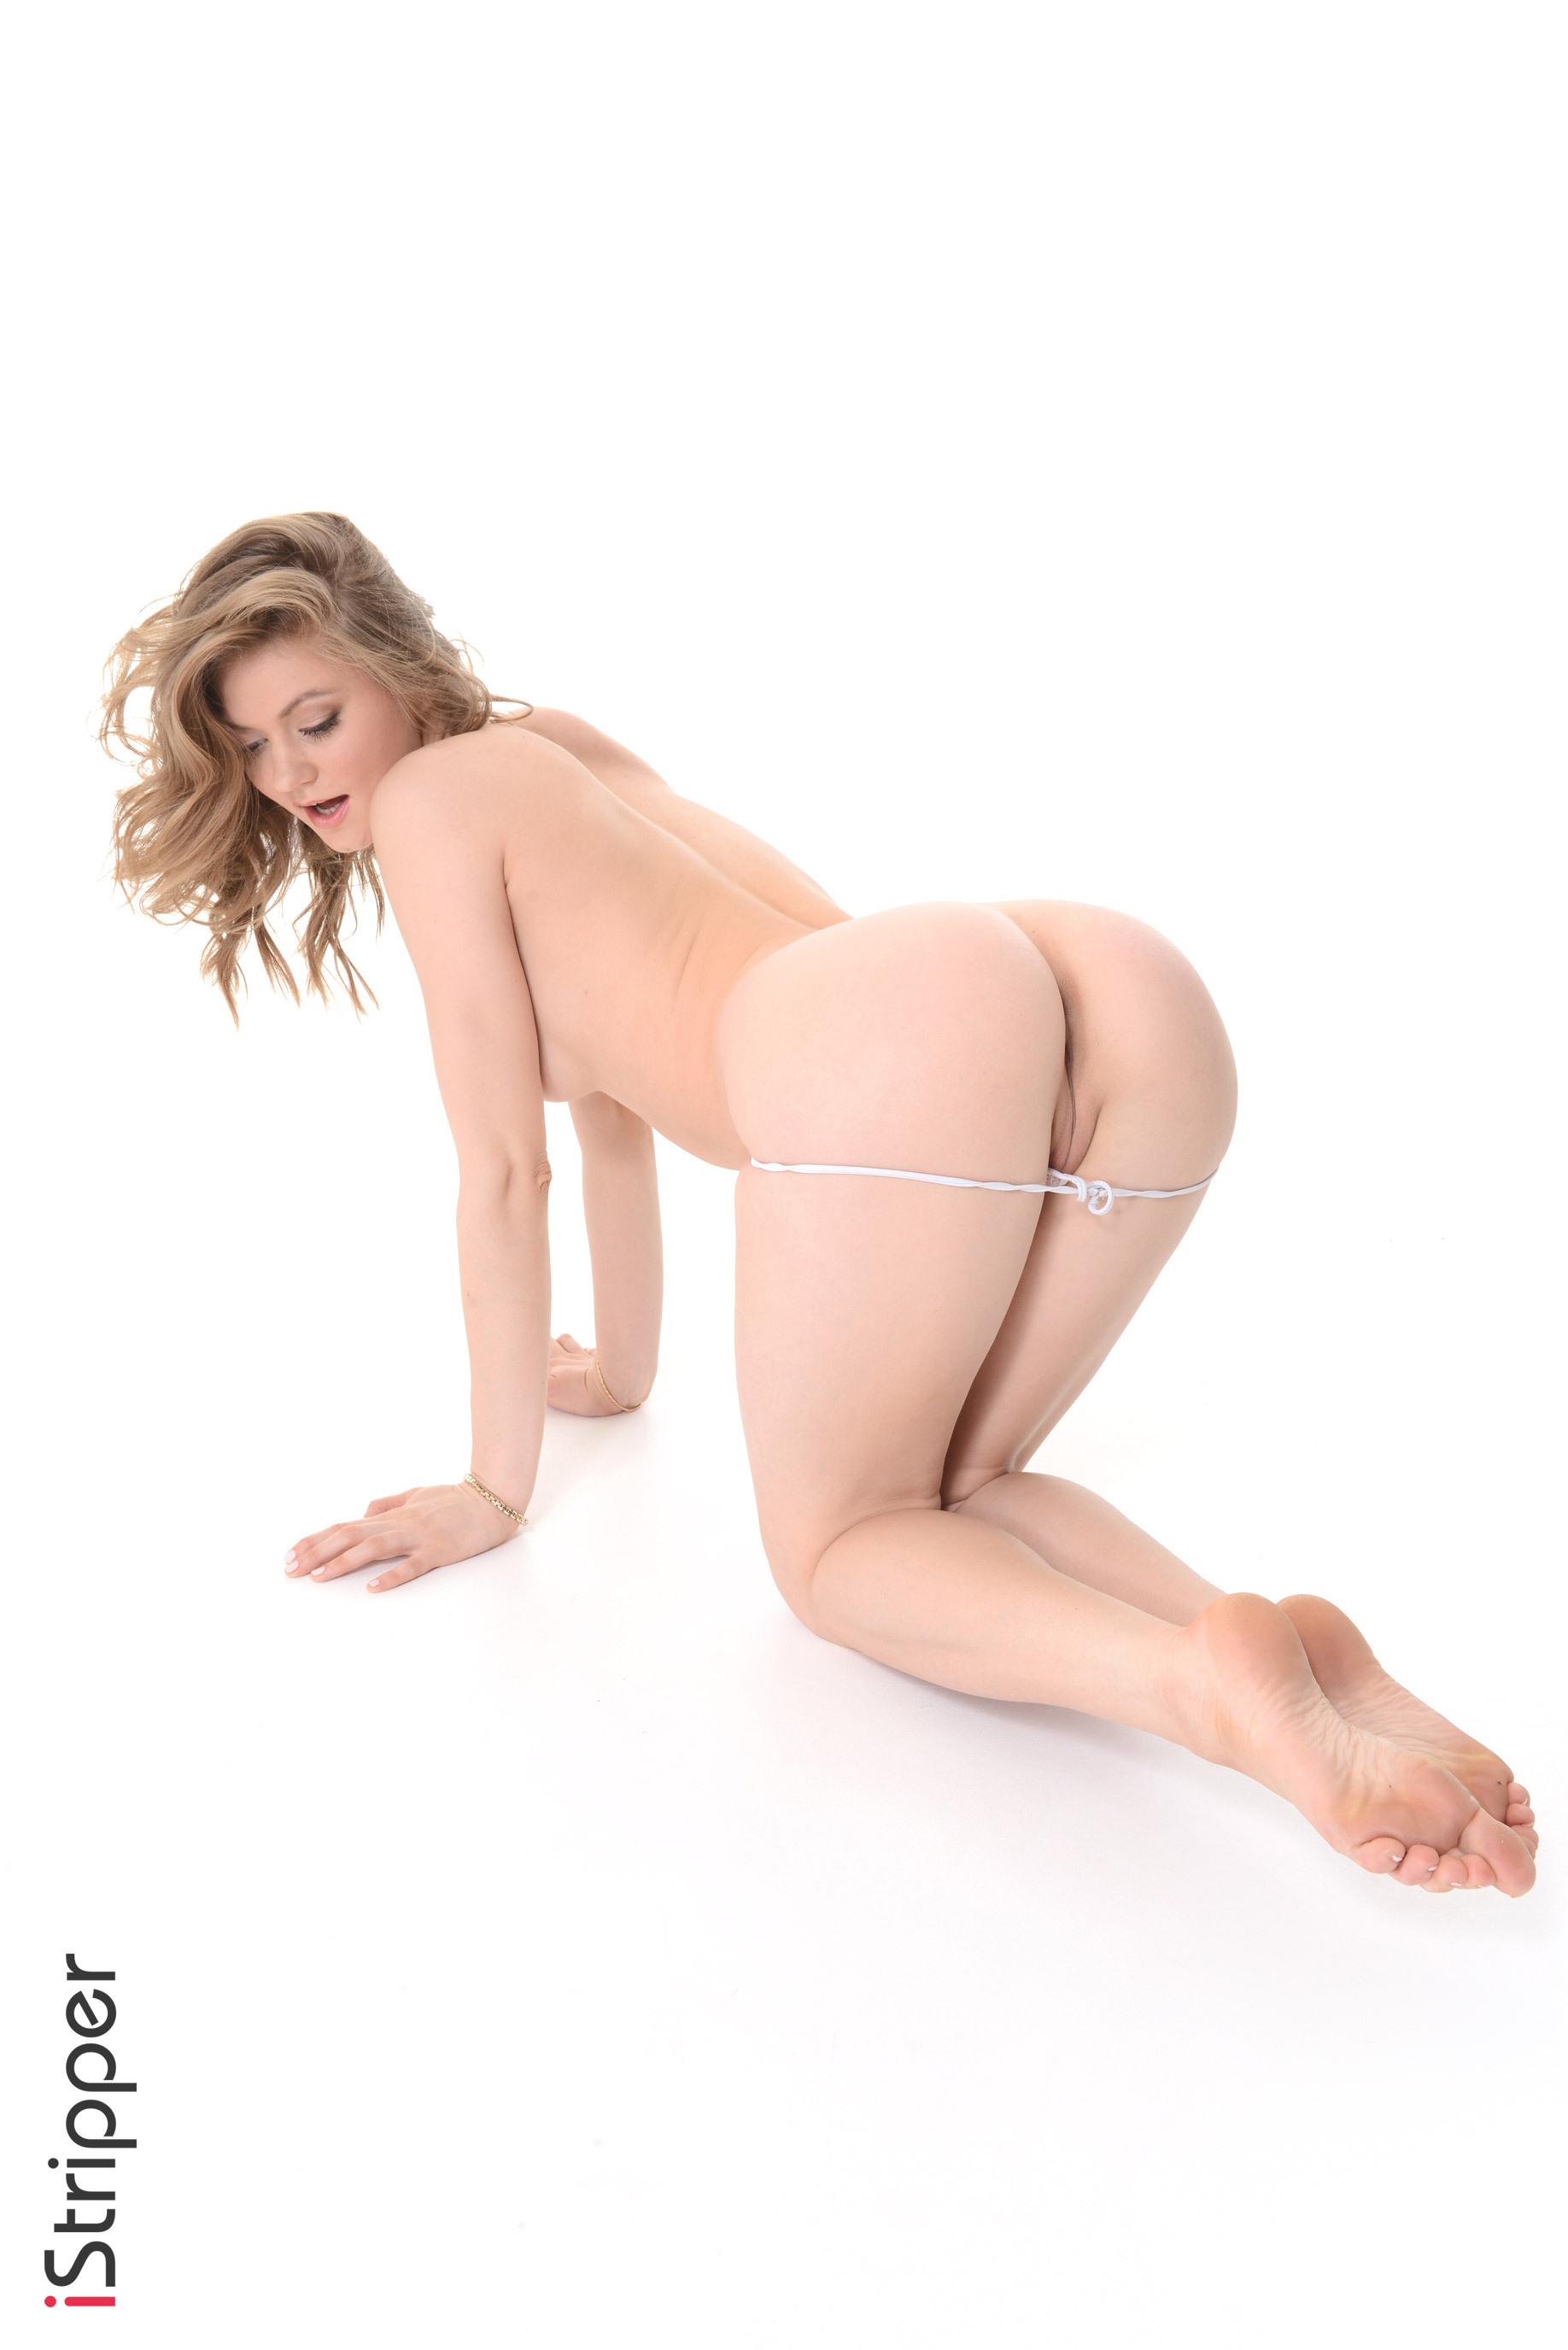 sexy eallpaper